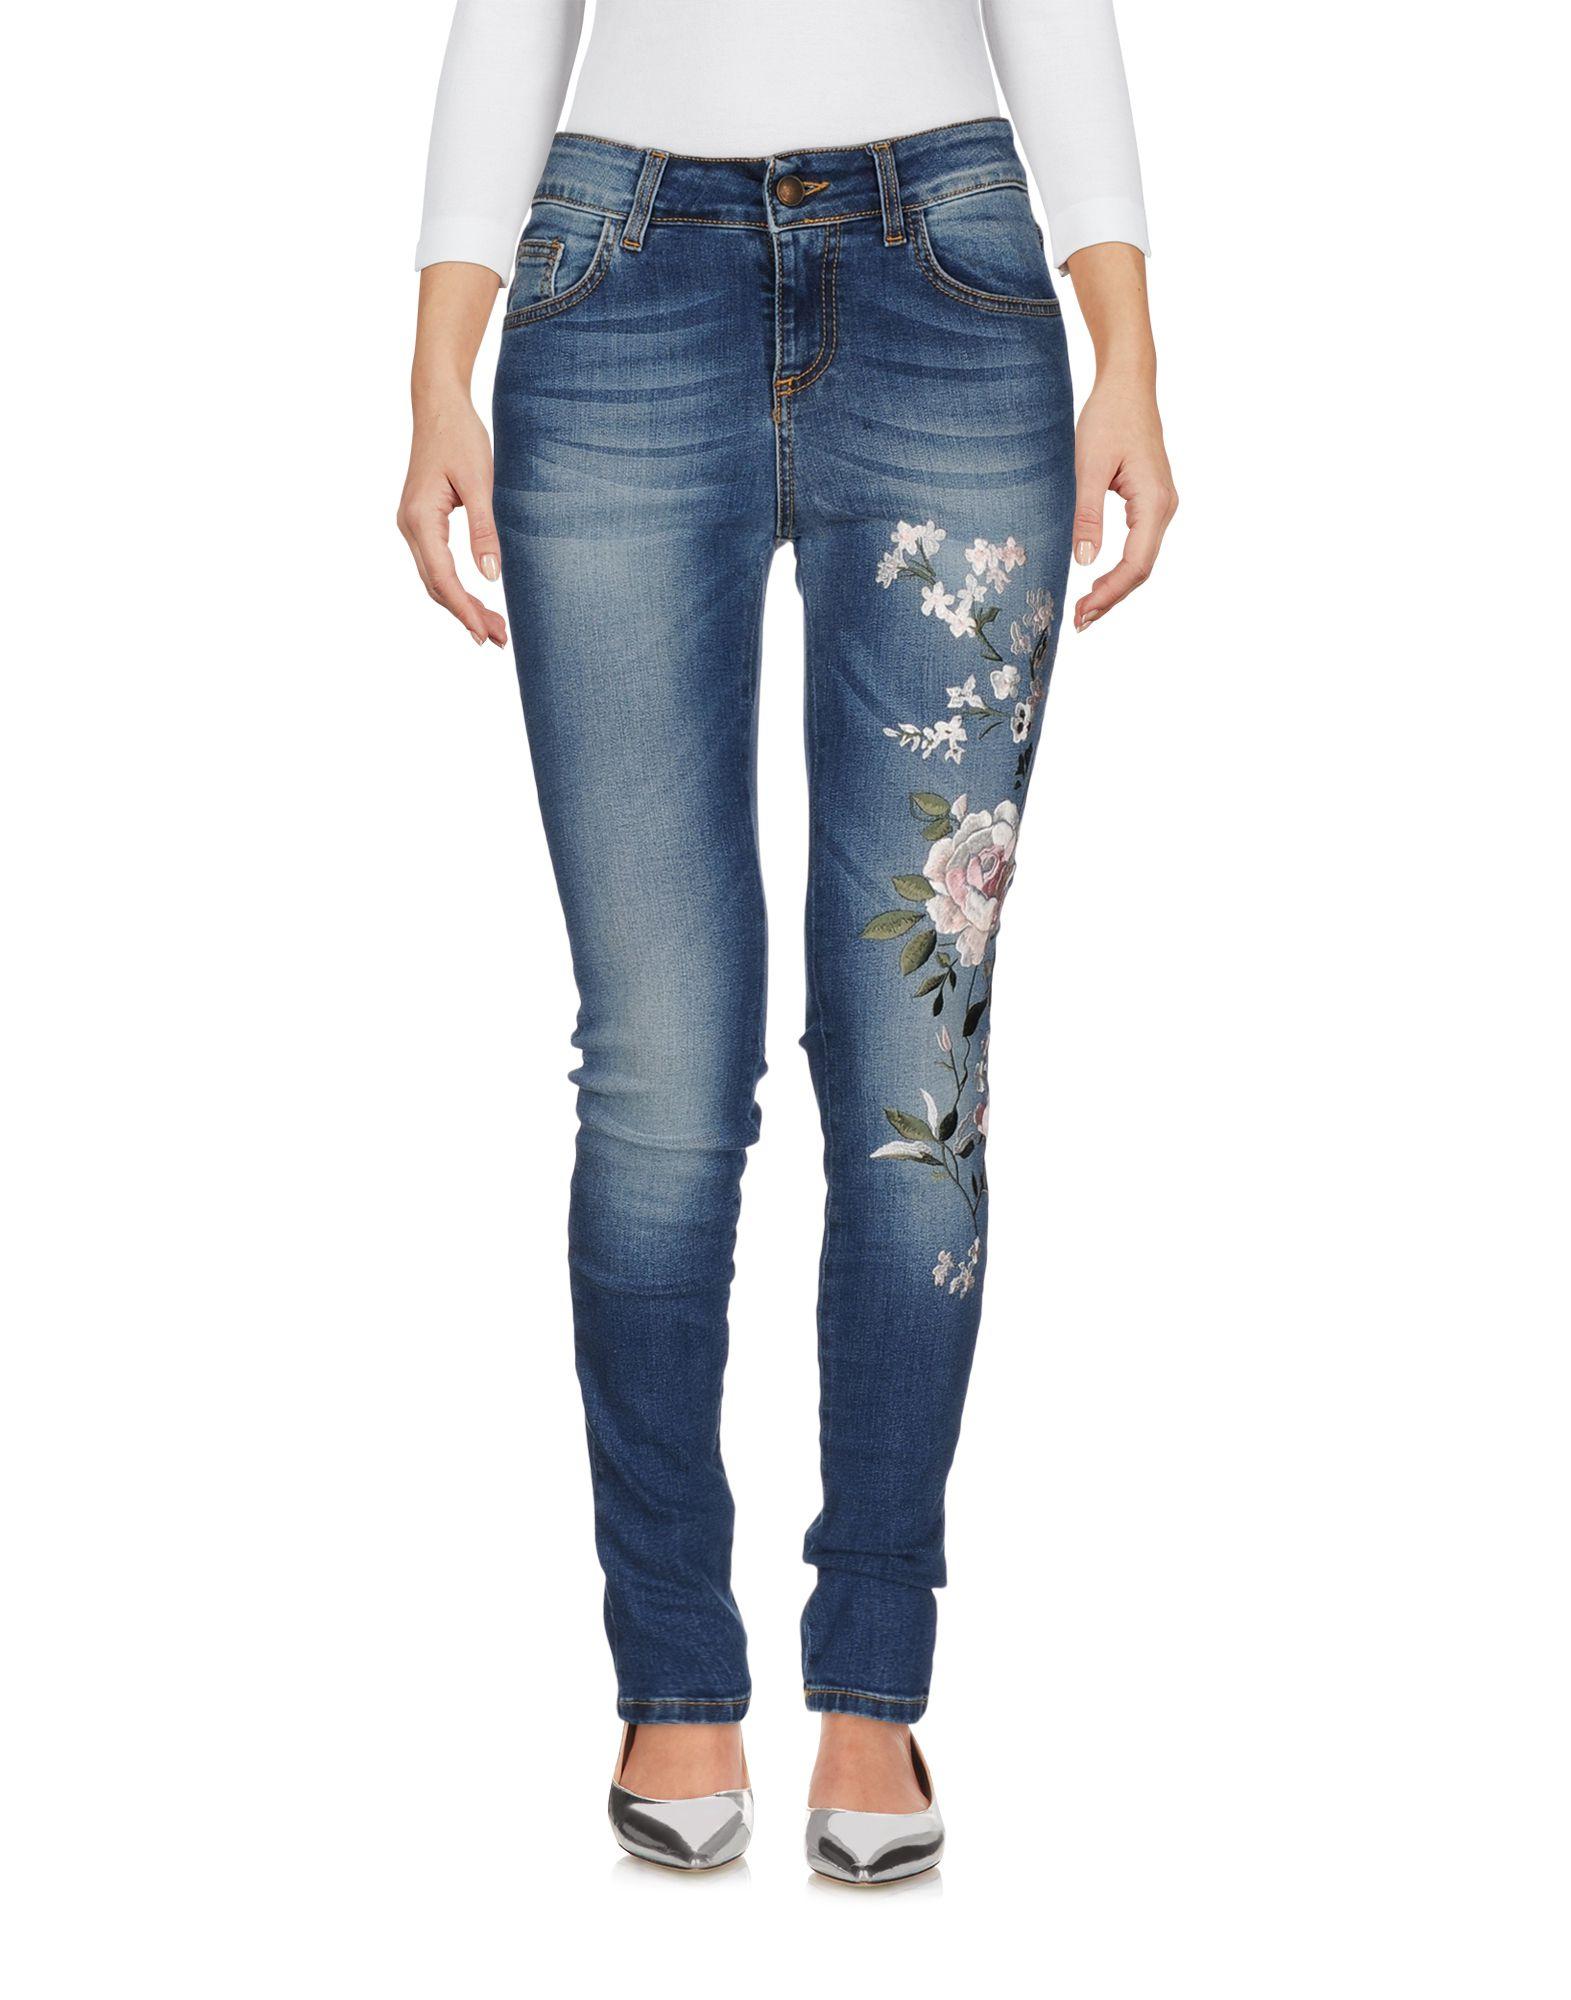 DENIM - Denim trousers Peacock Blue Discount Latest Cheap Very Cheap lwpl7PP